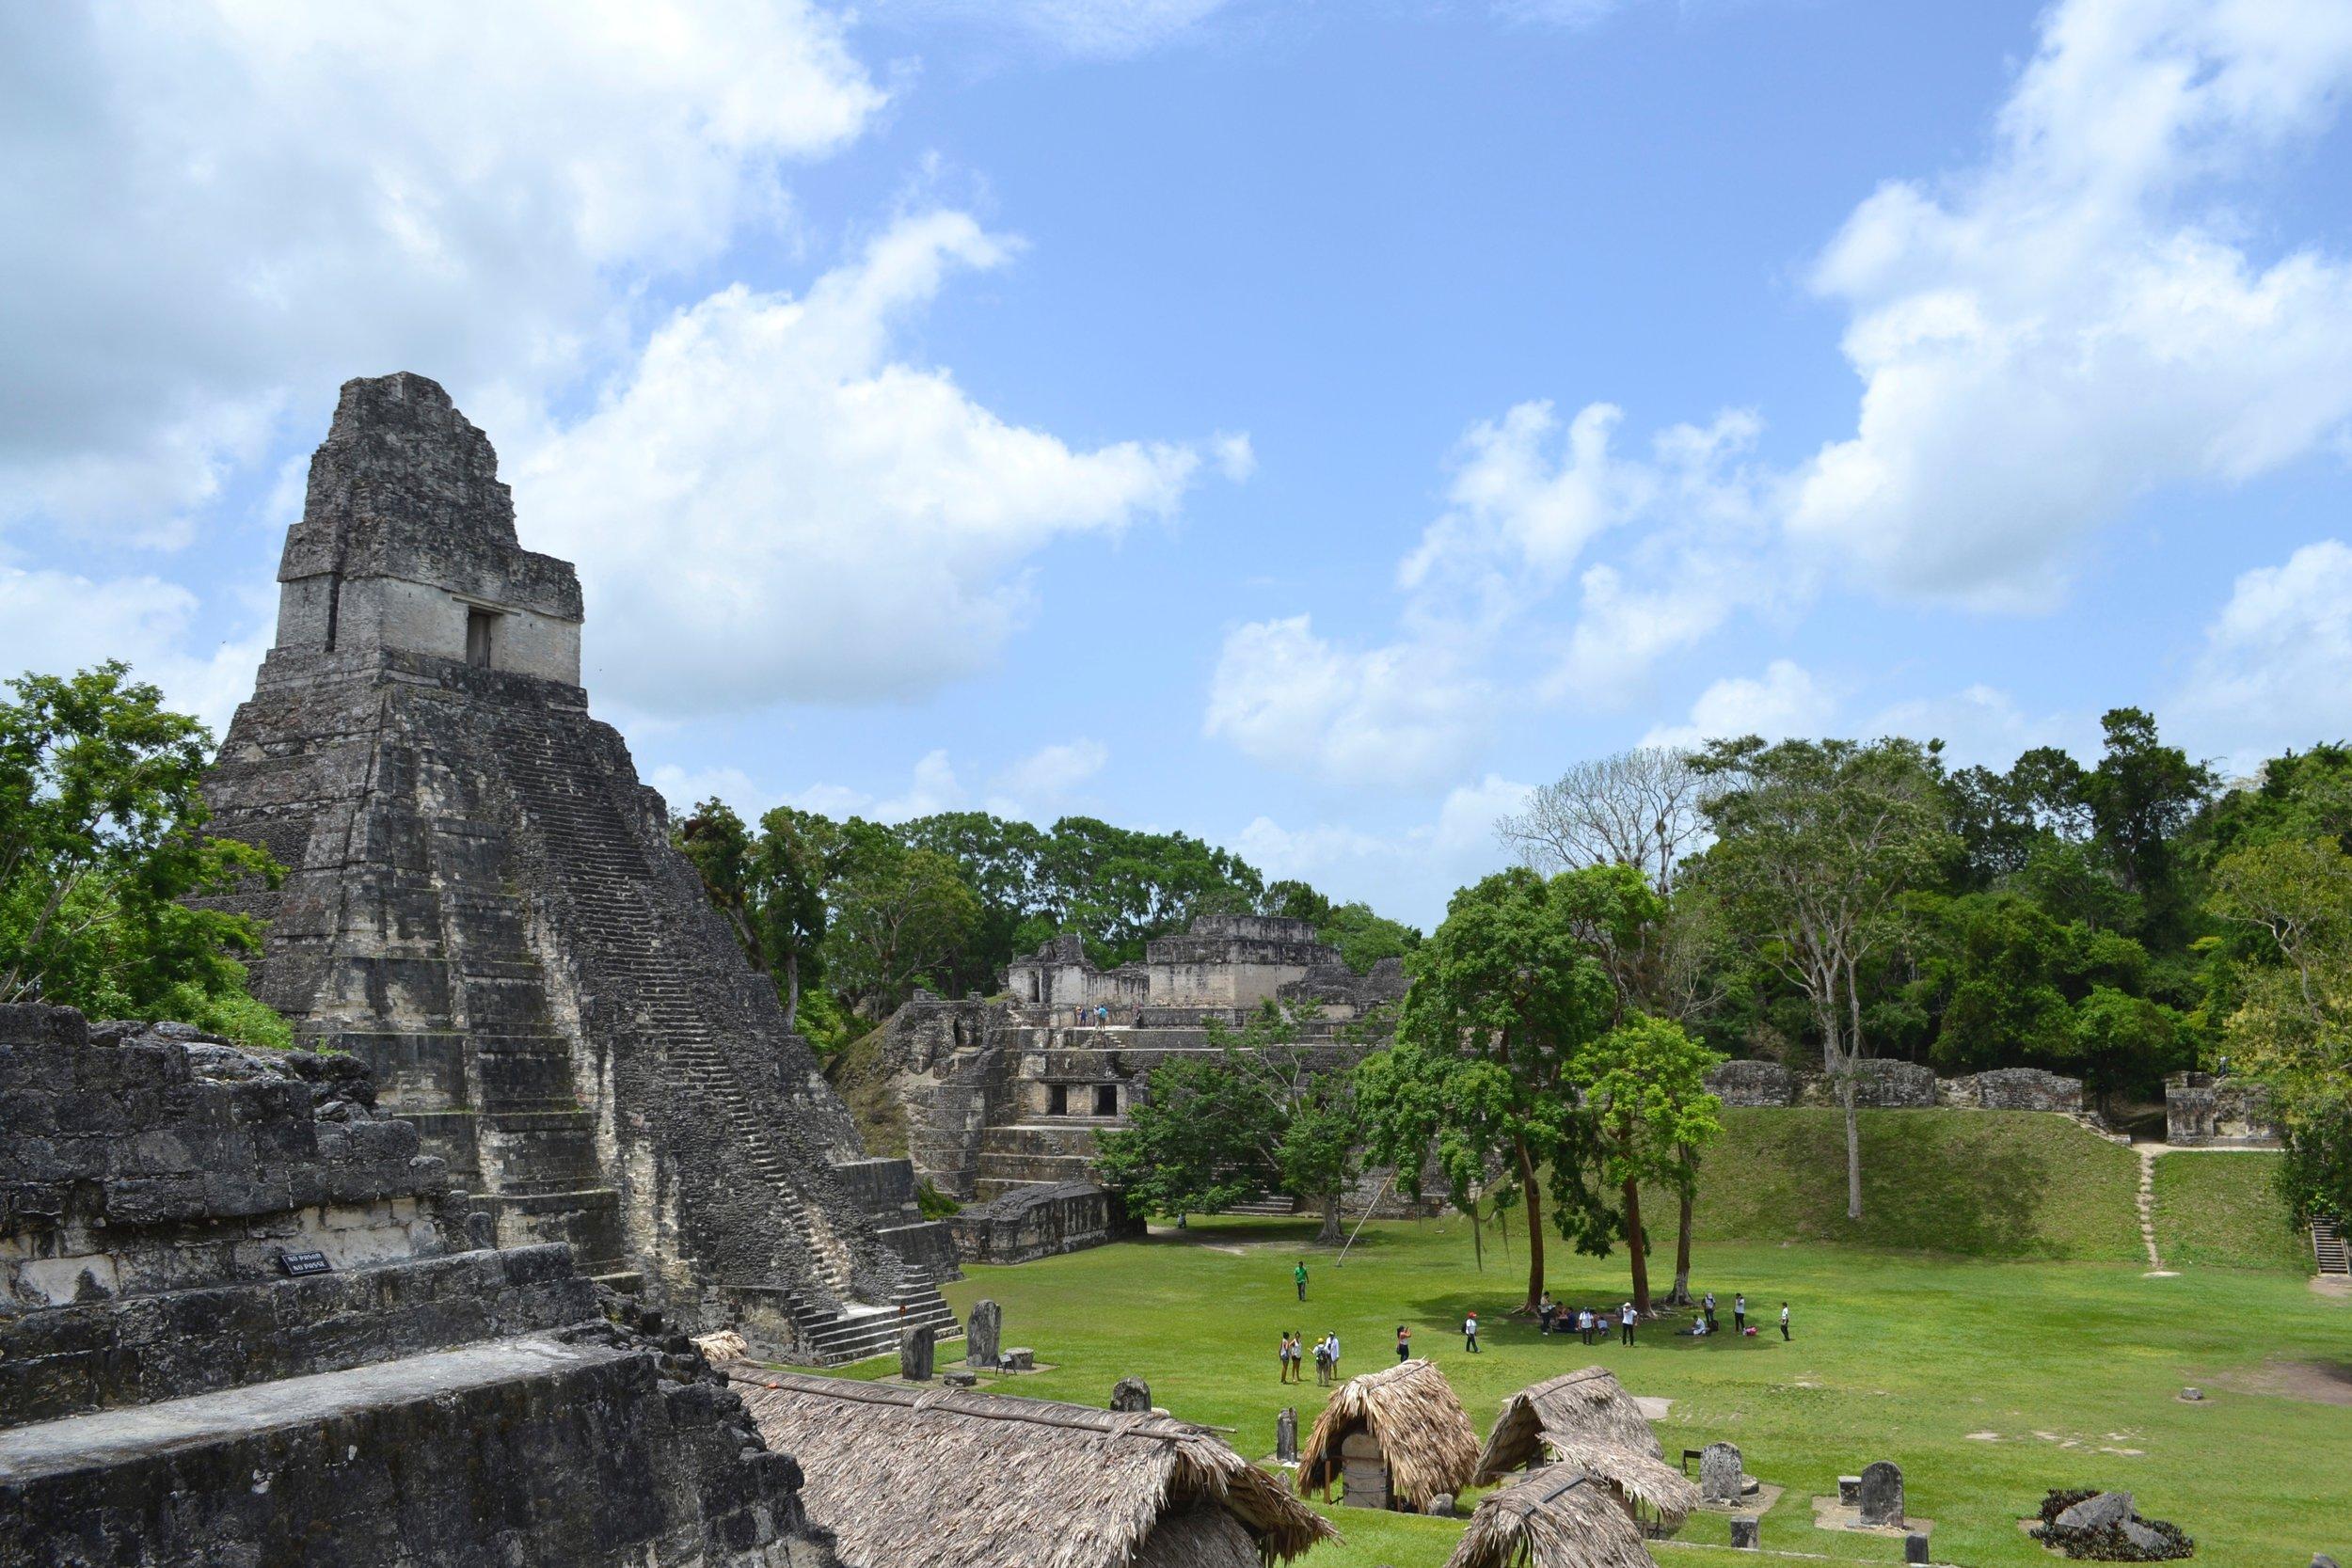 A view of Tikal, Guatemala